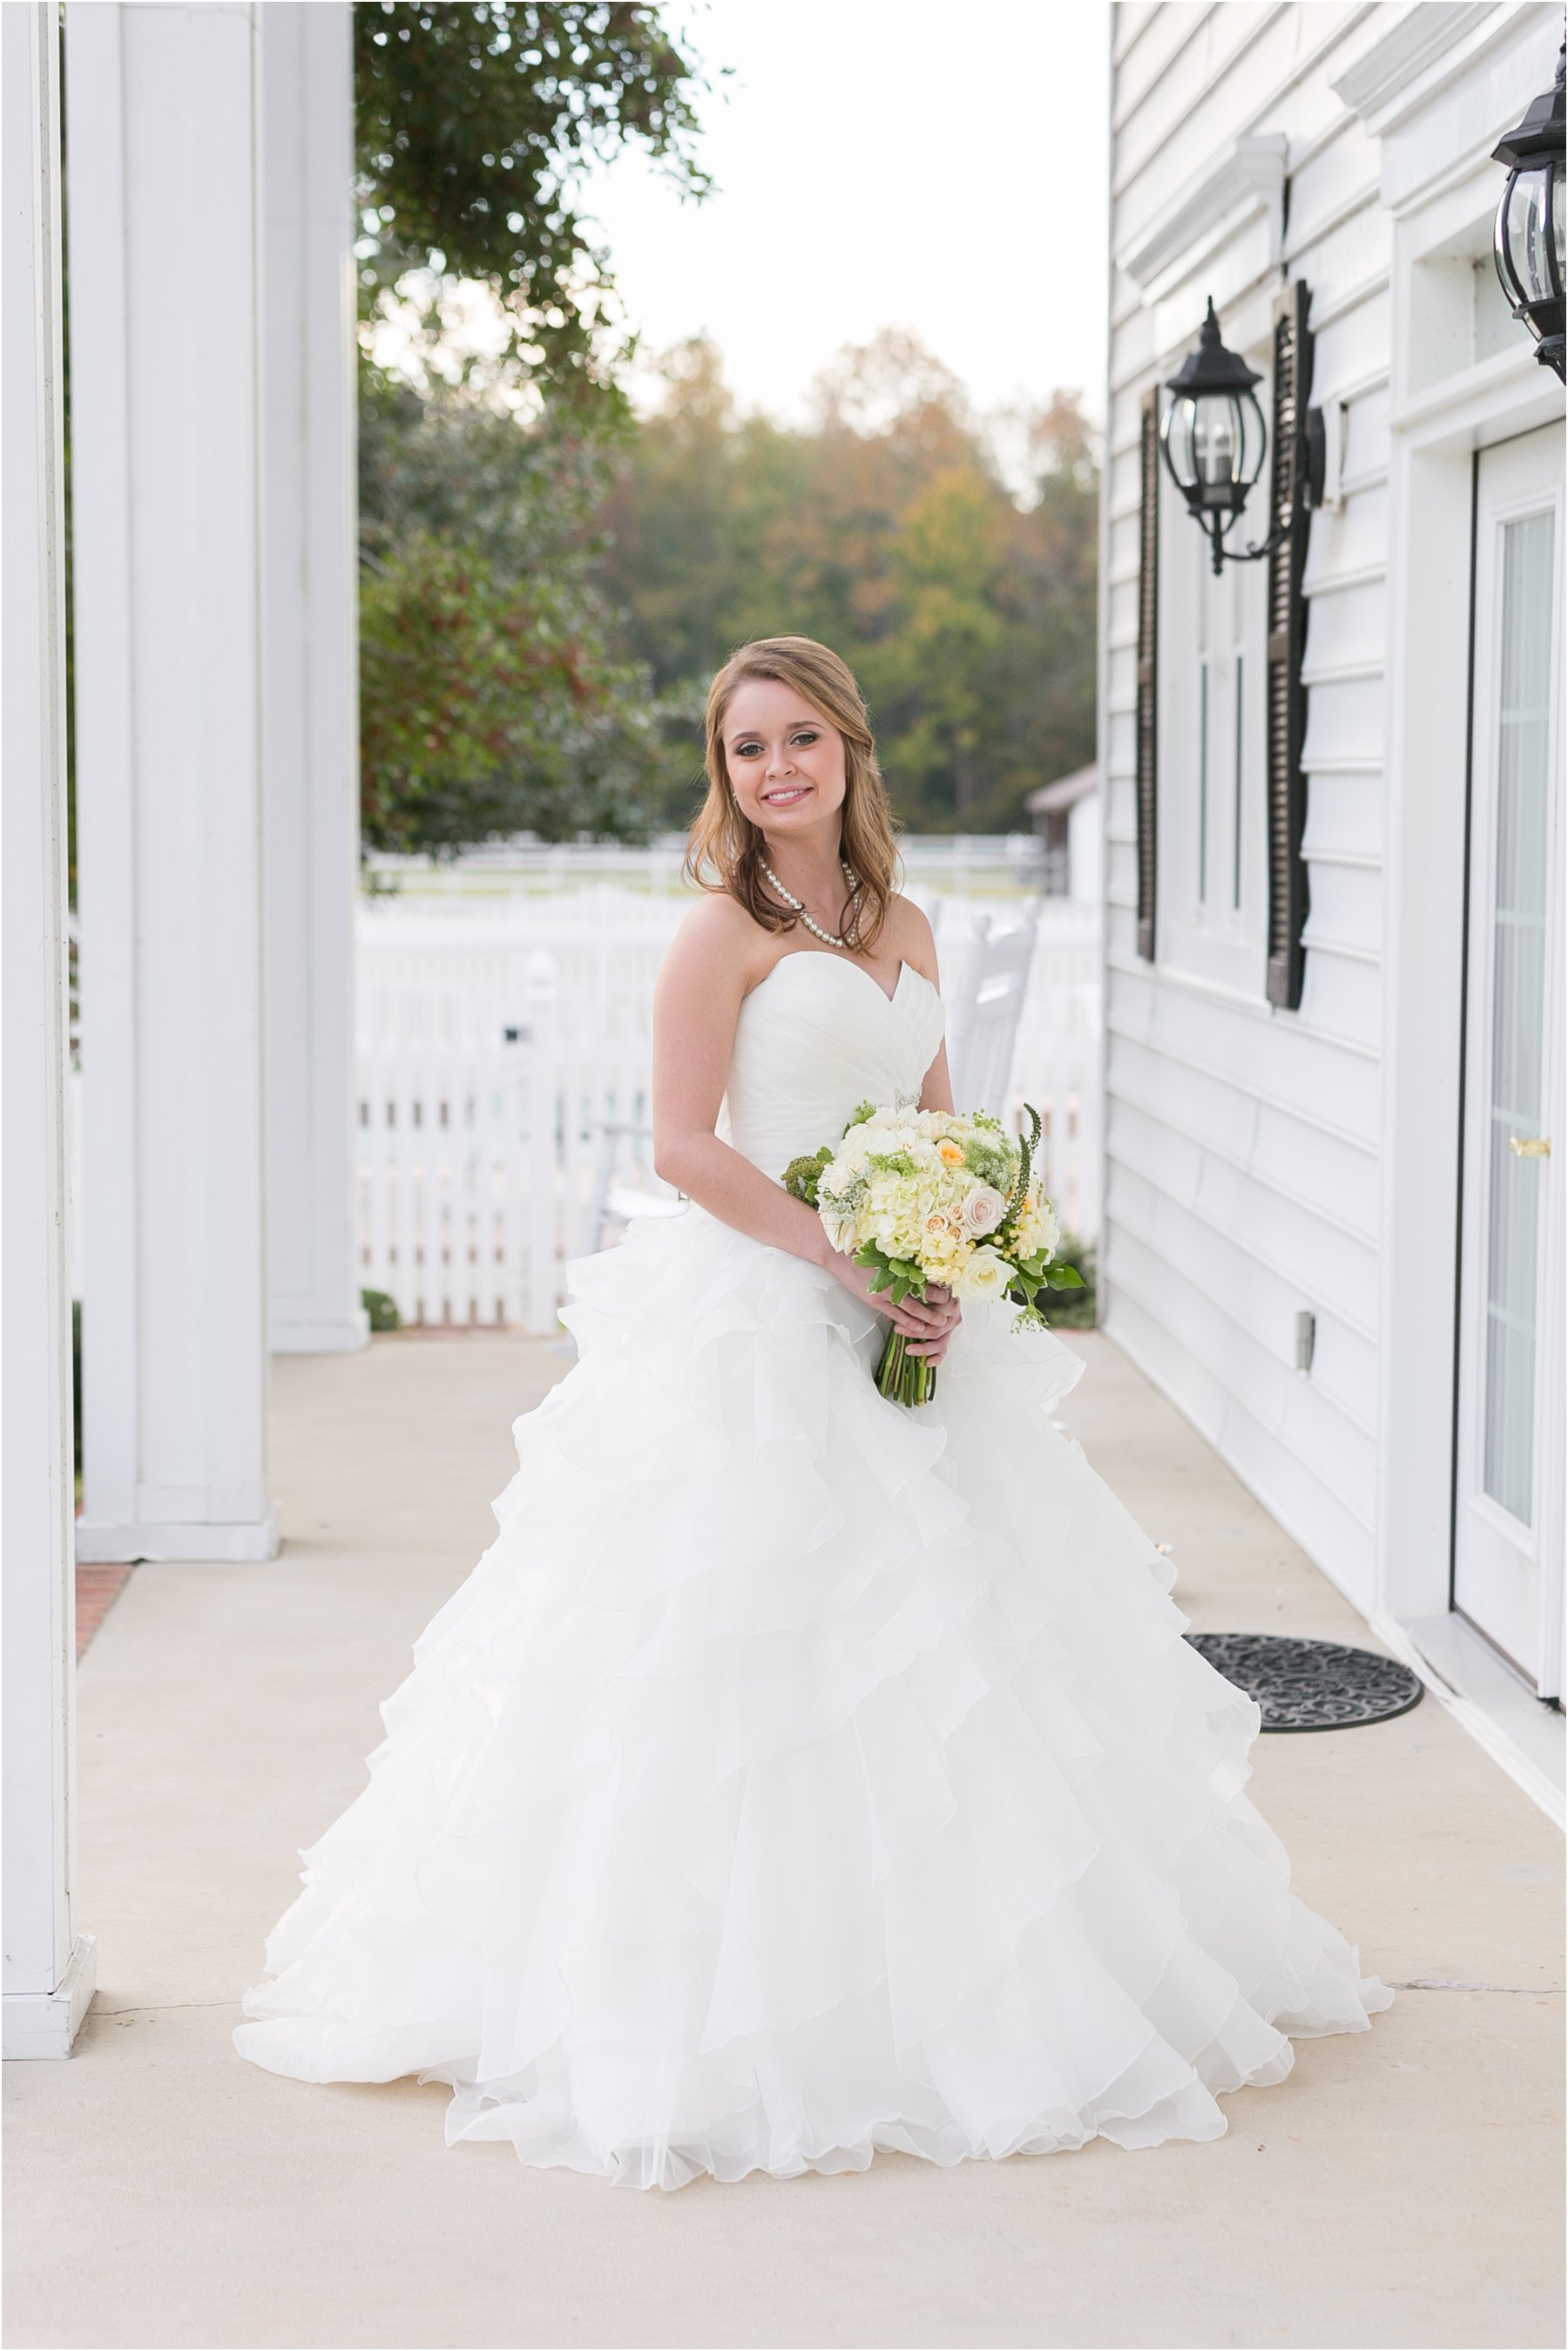 Holly_Ridge_Manor_Wedding_Photography_Jessica_Ryan_Photography_virginia_virginia_beach_0262